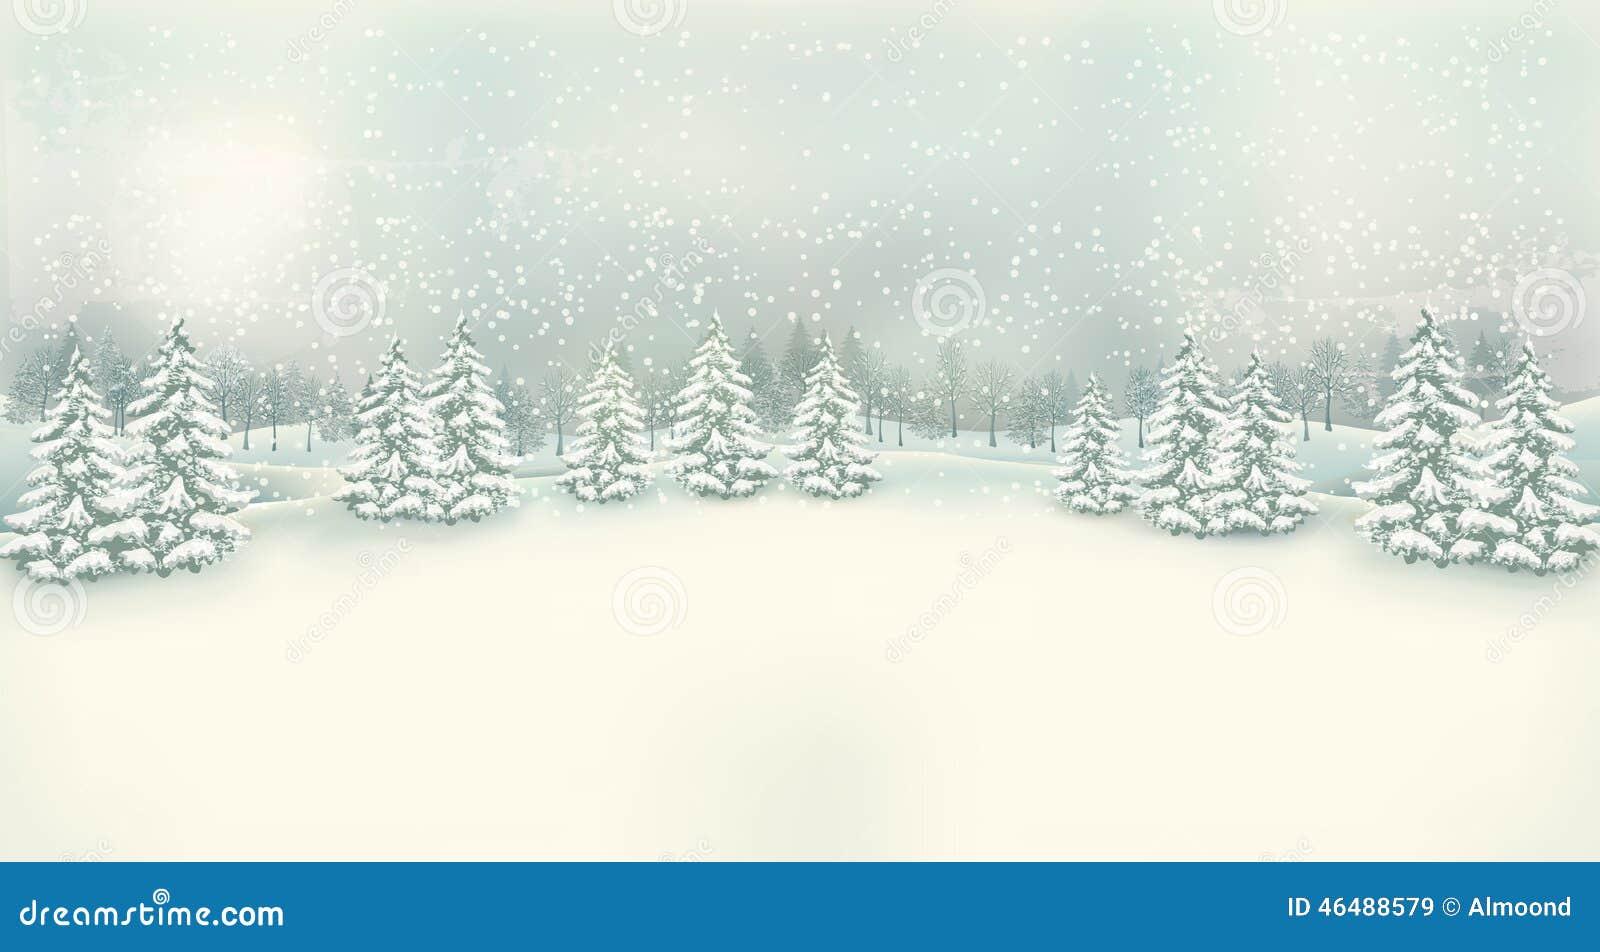 Vintage Christmas Wint...